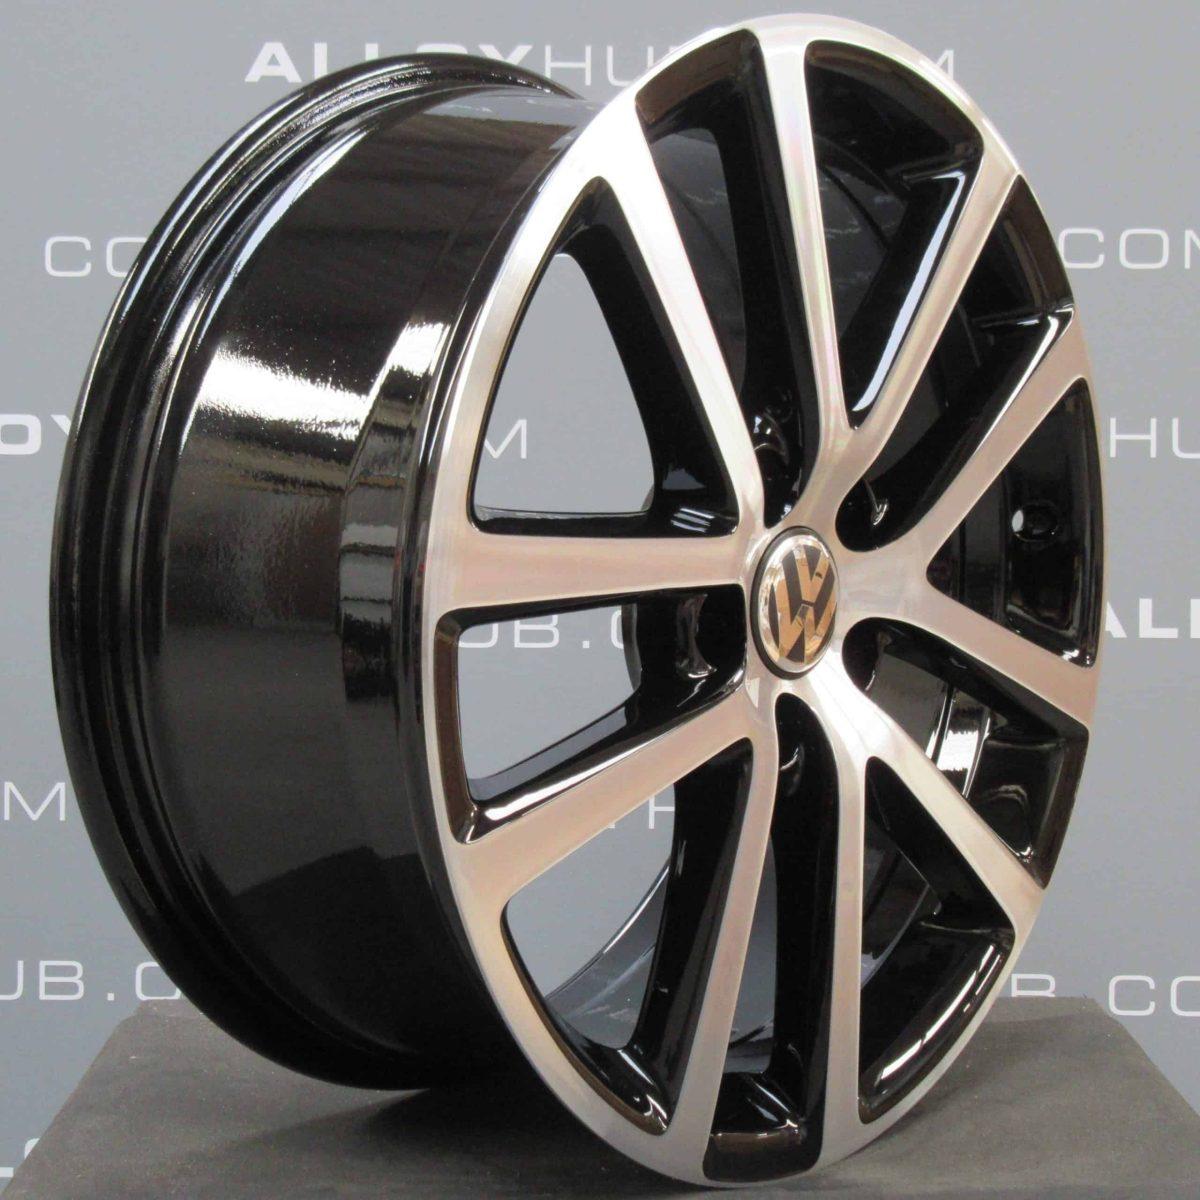 "Volkswagen Golf MK6 Charleston 5 Twin Spoke 18"" Gloss Black/Diamond Turned Alloy Wheel"